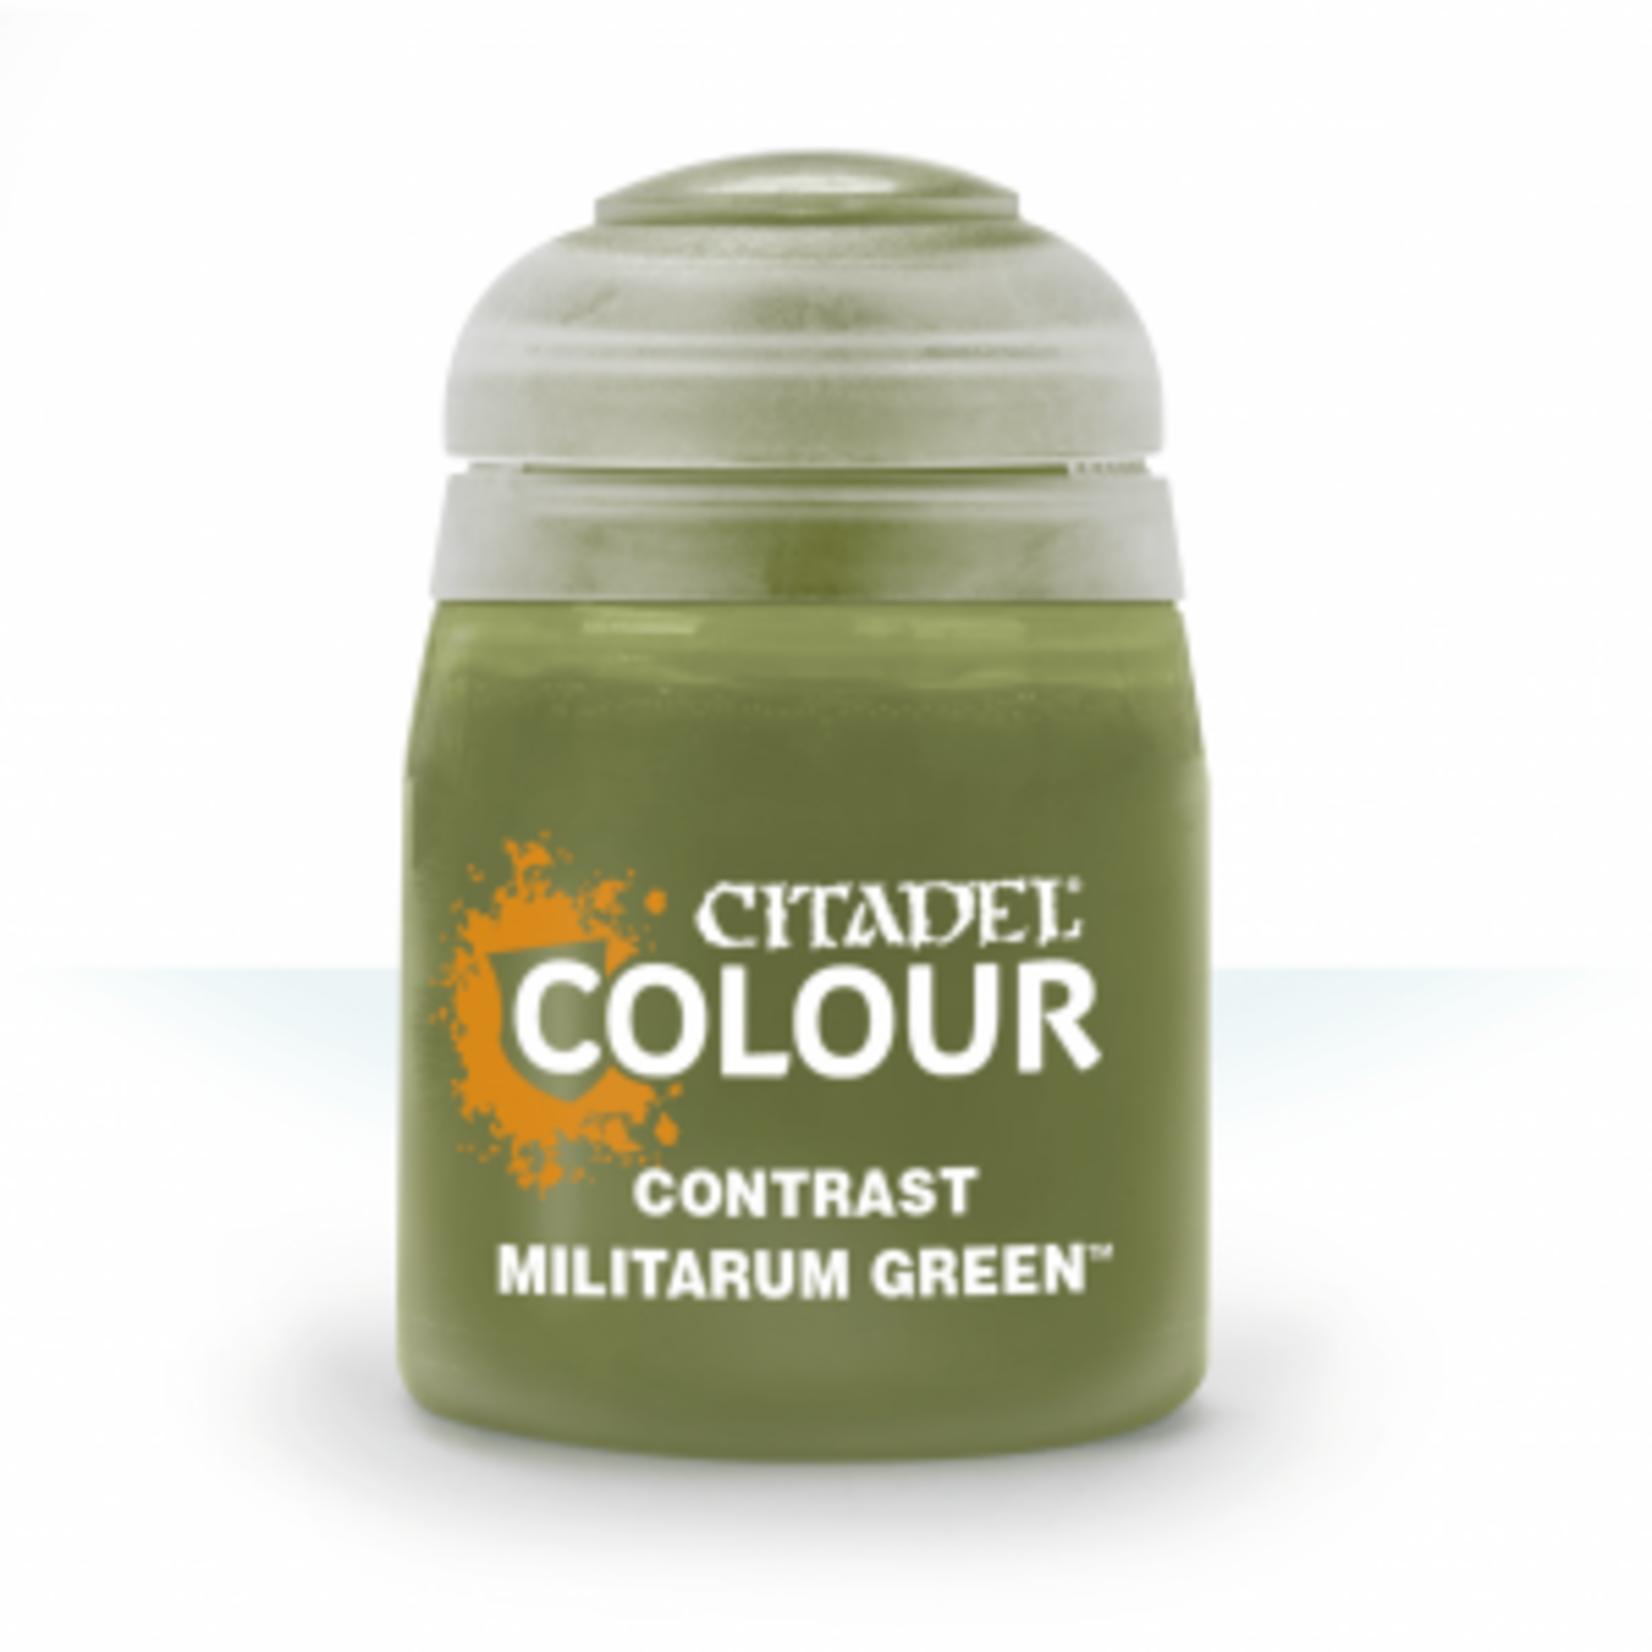 Citadel Contrast Militarum Green